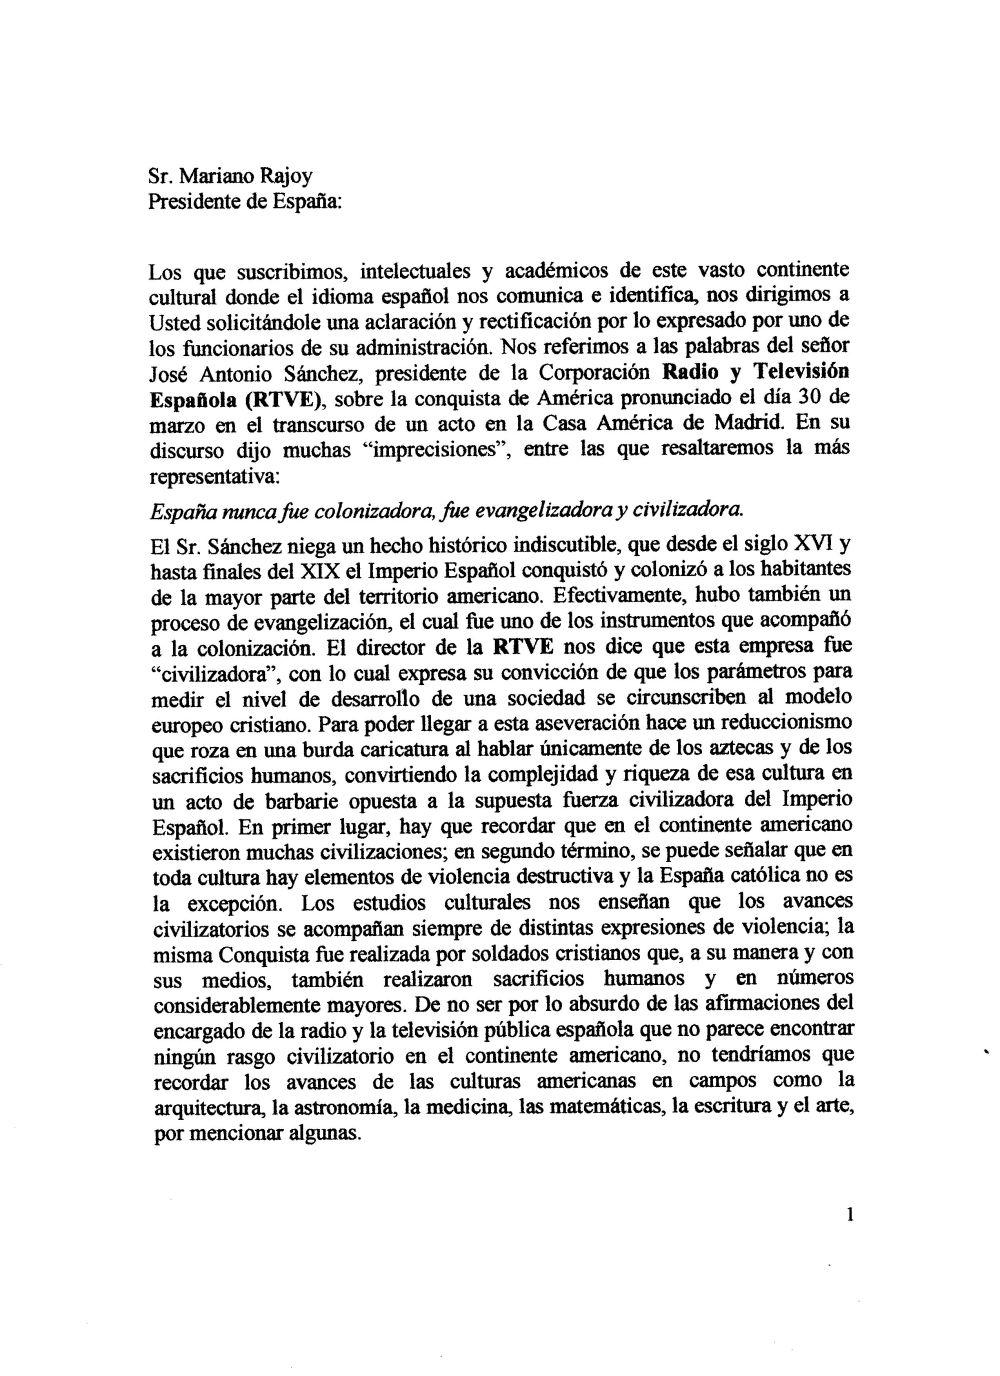 Carta Rajoy001